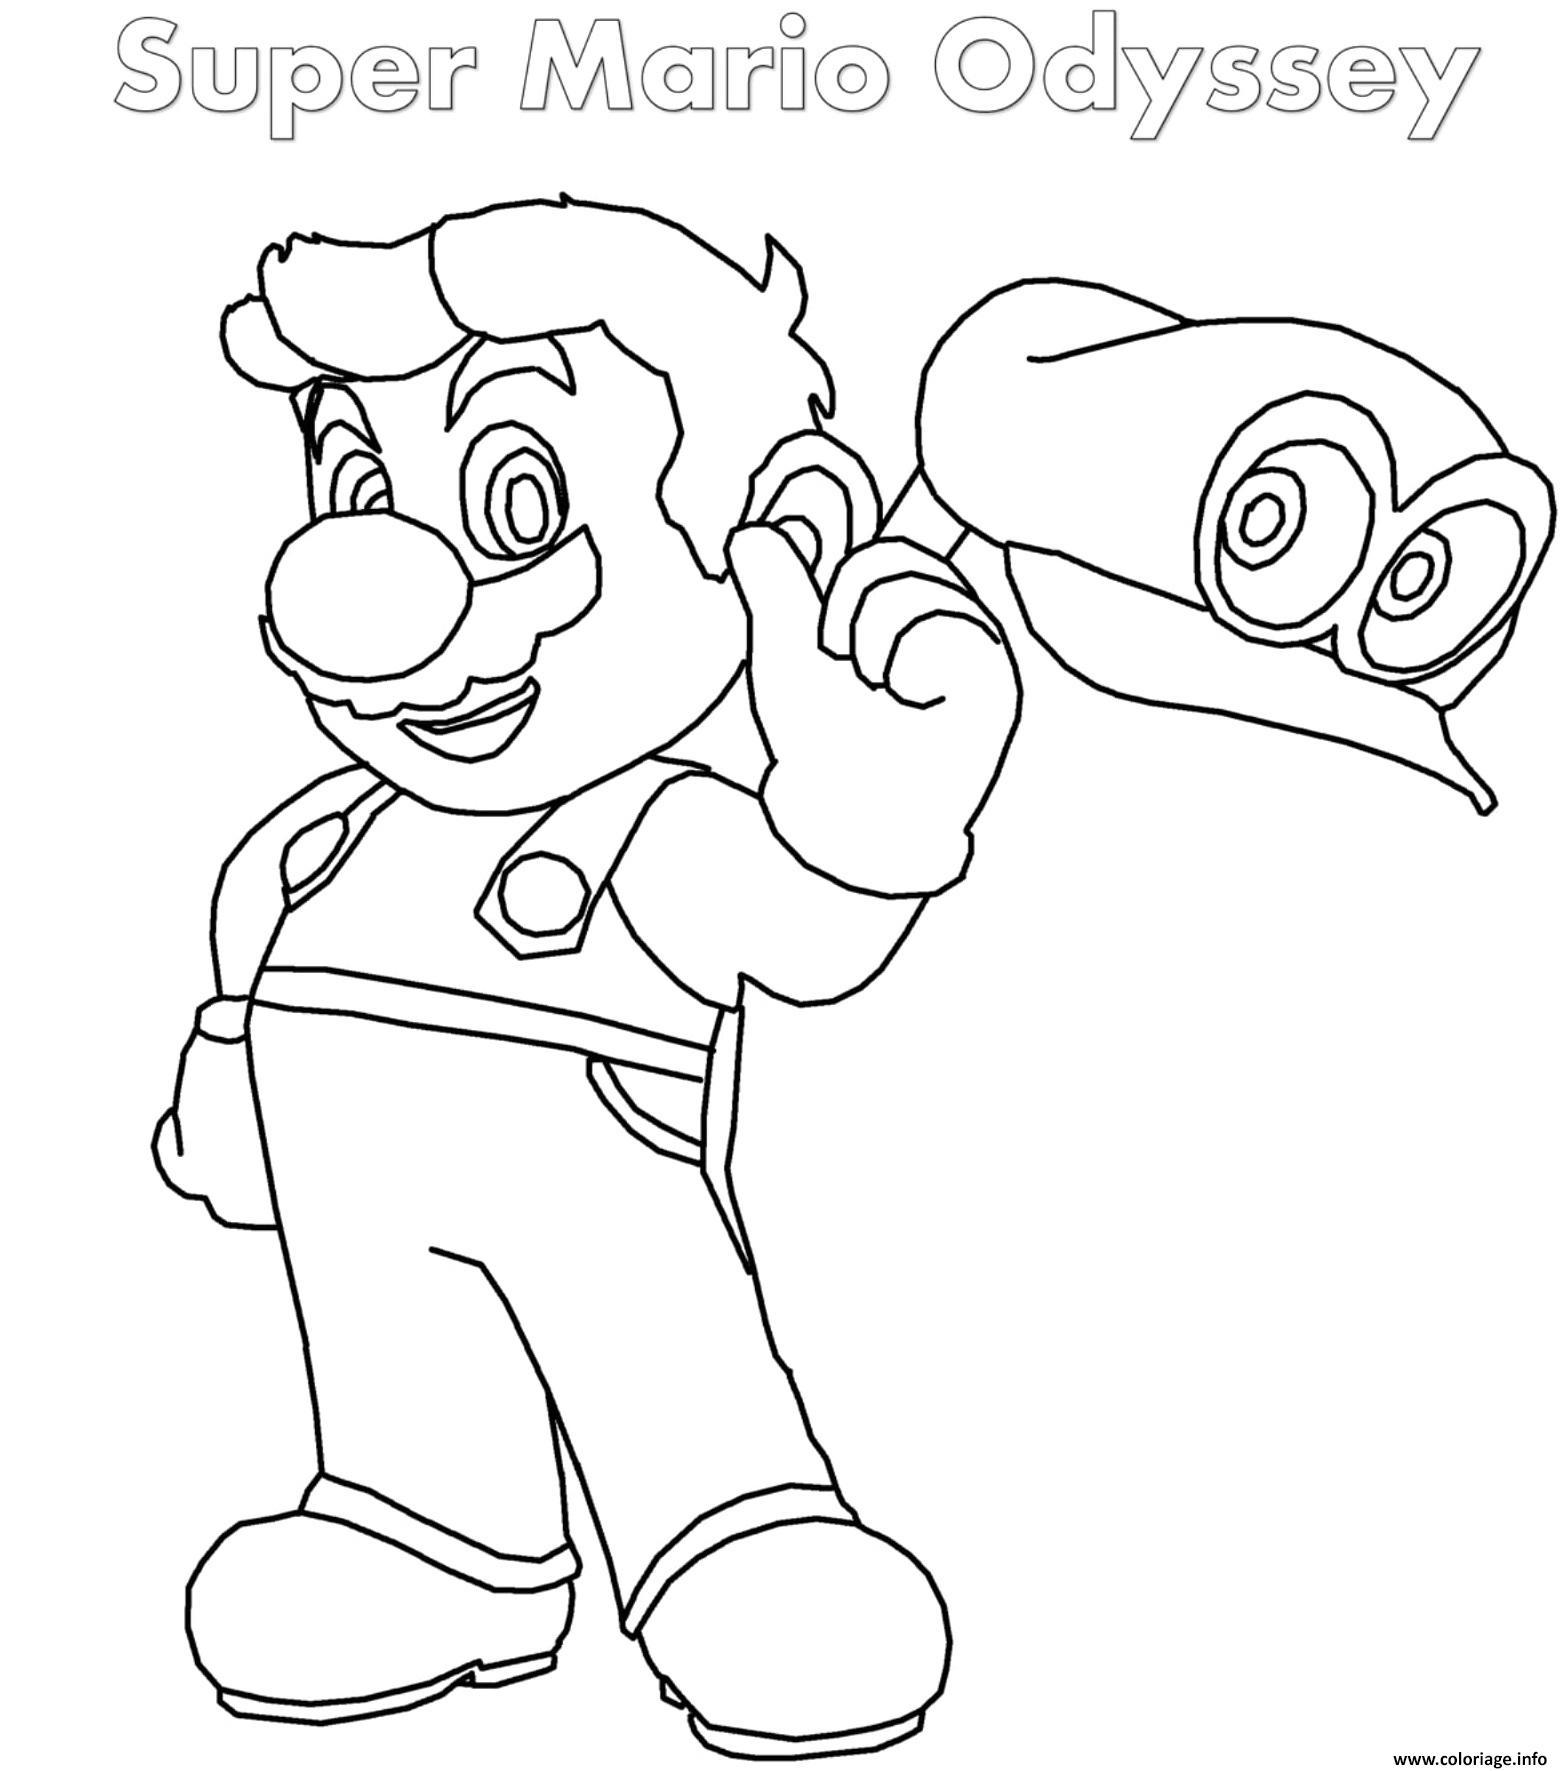 Coloriage Super Mario Odyssey Jecolorie Com